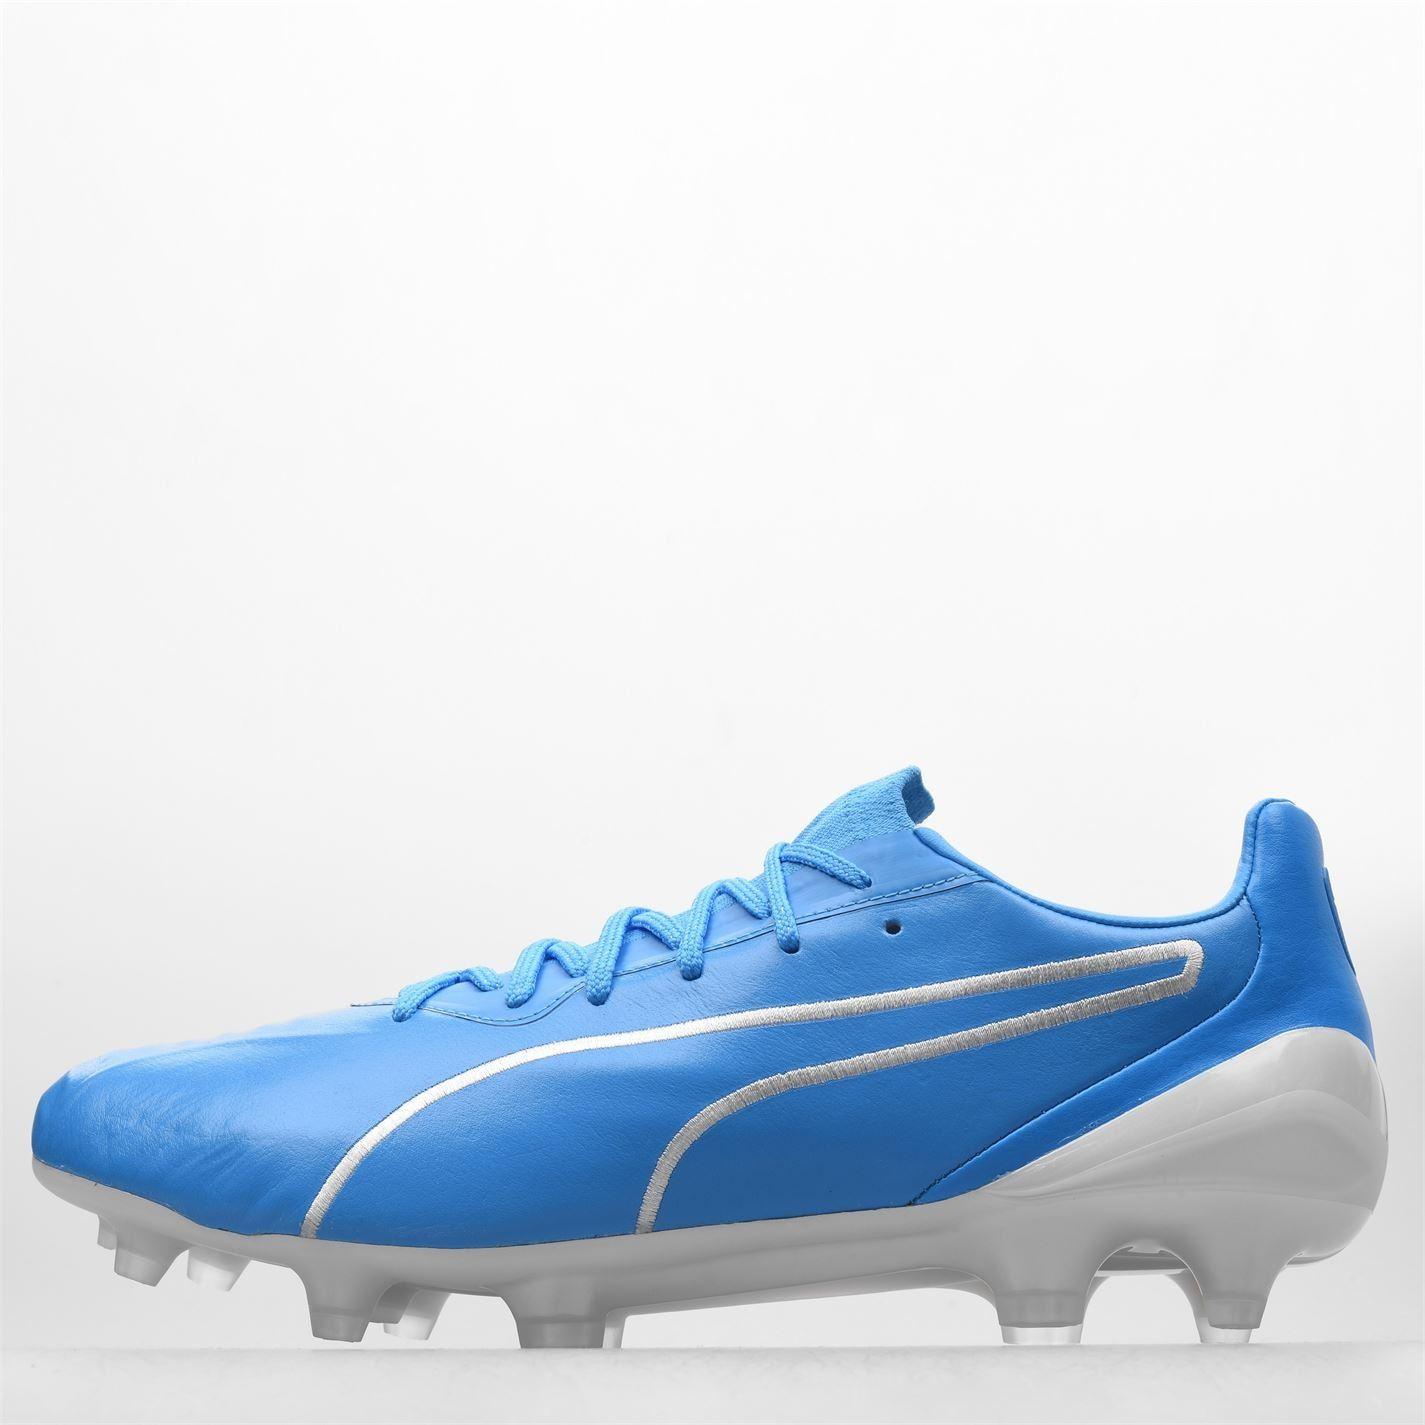 miniature 12 - Puma-King-FG-Firm-Ground-Football-Bottes-Homme-Chaussures-De-Foot-Crampons-Baskets